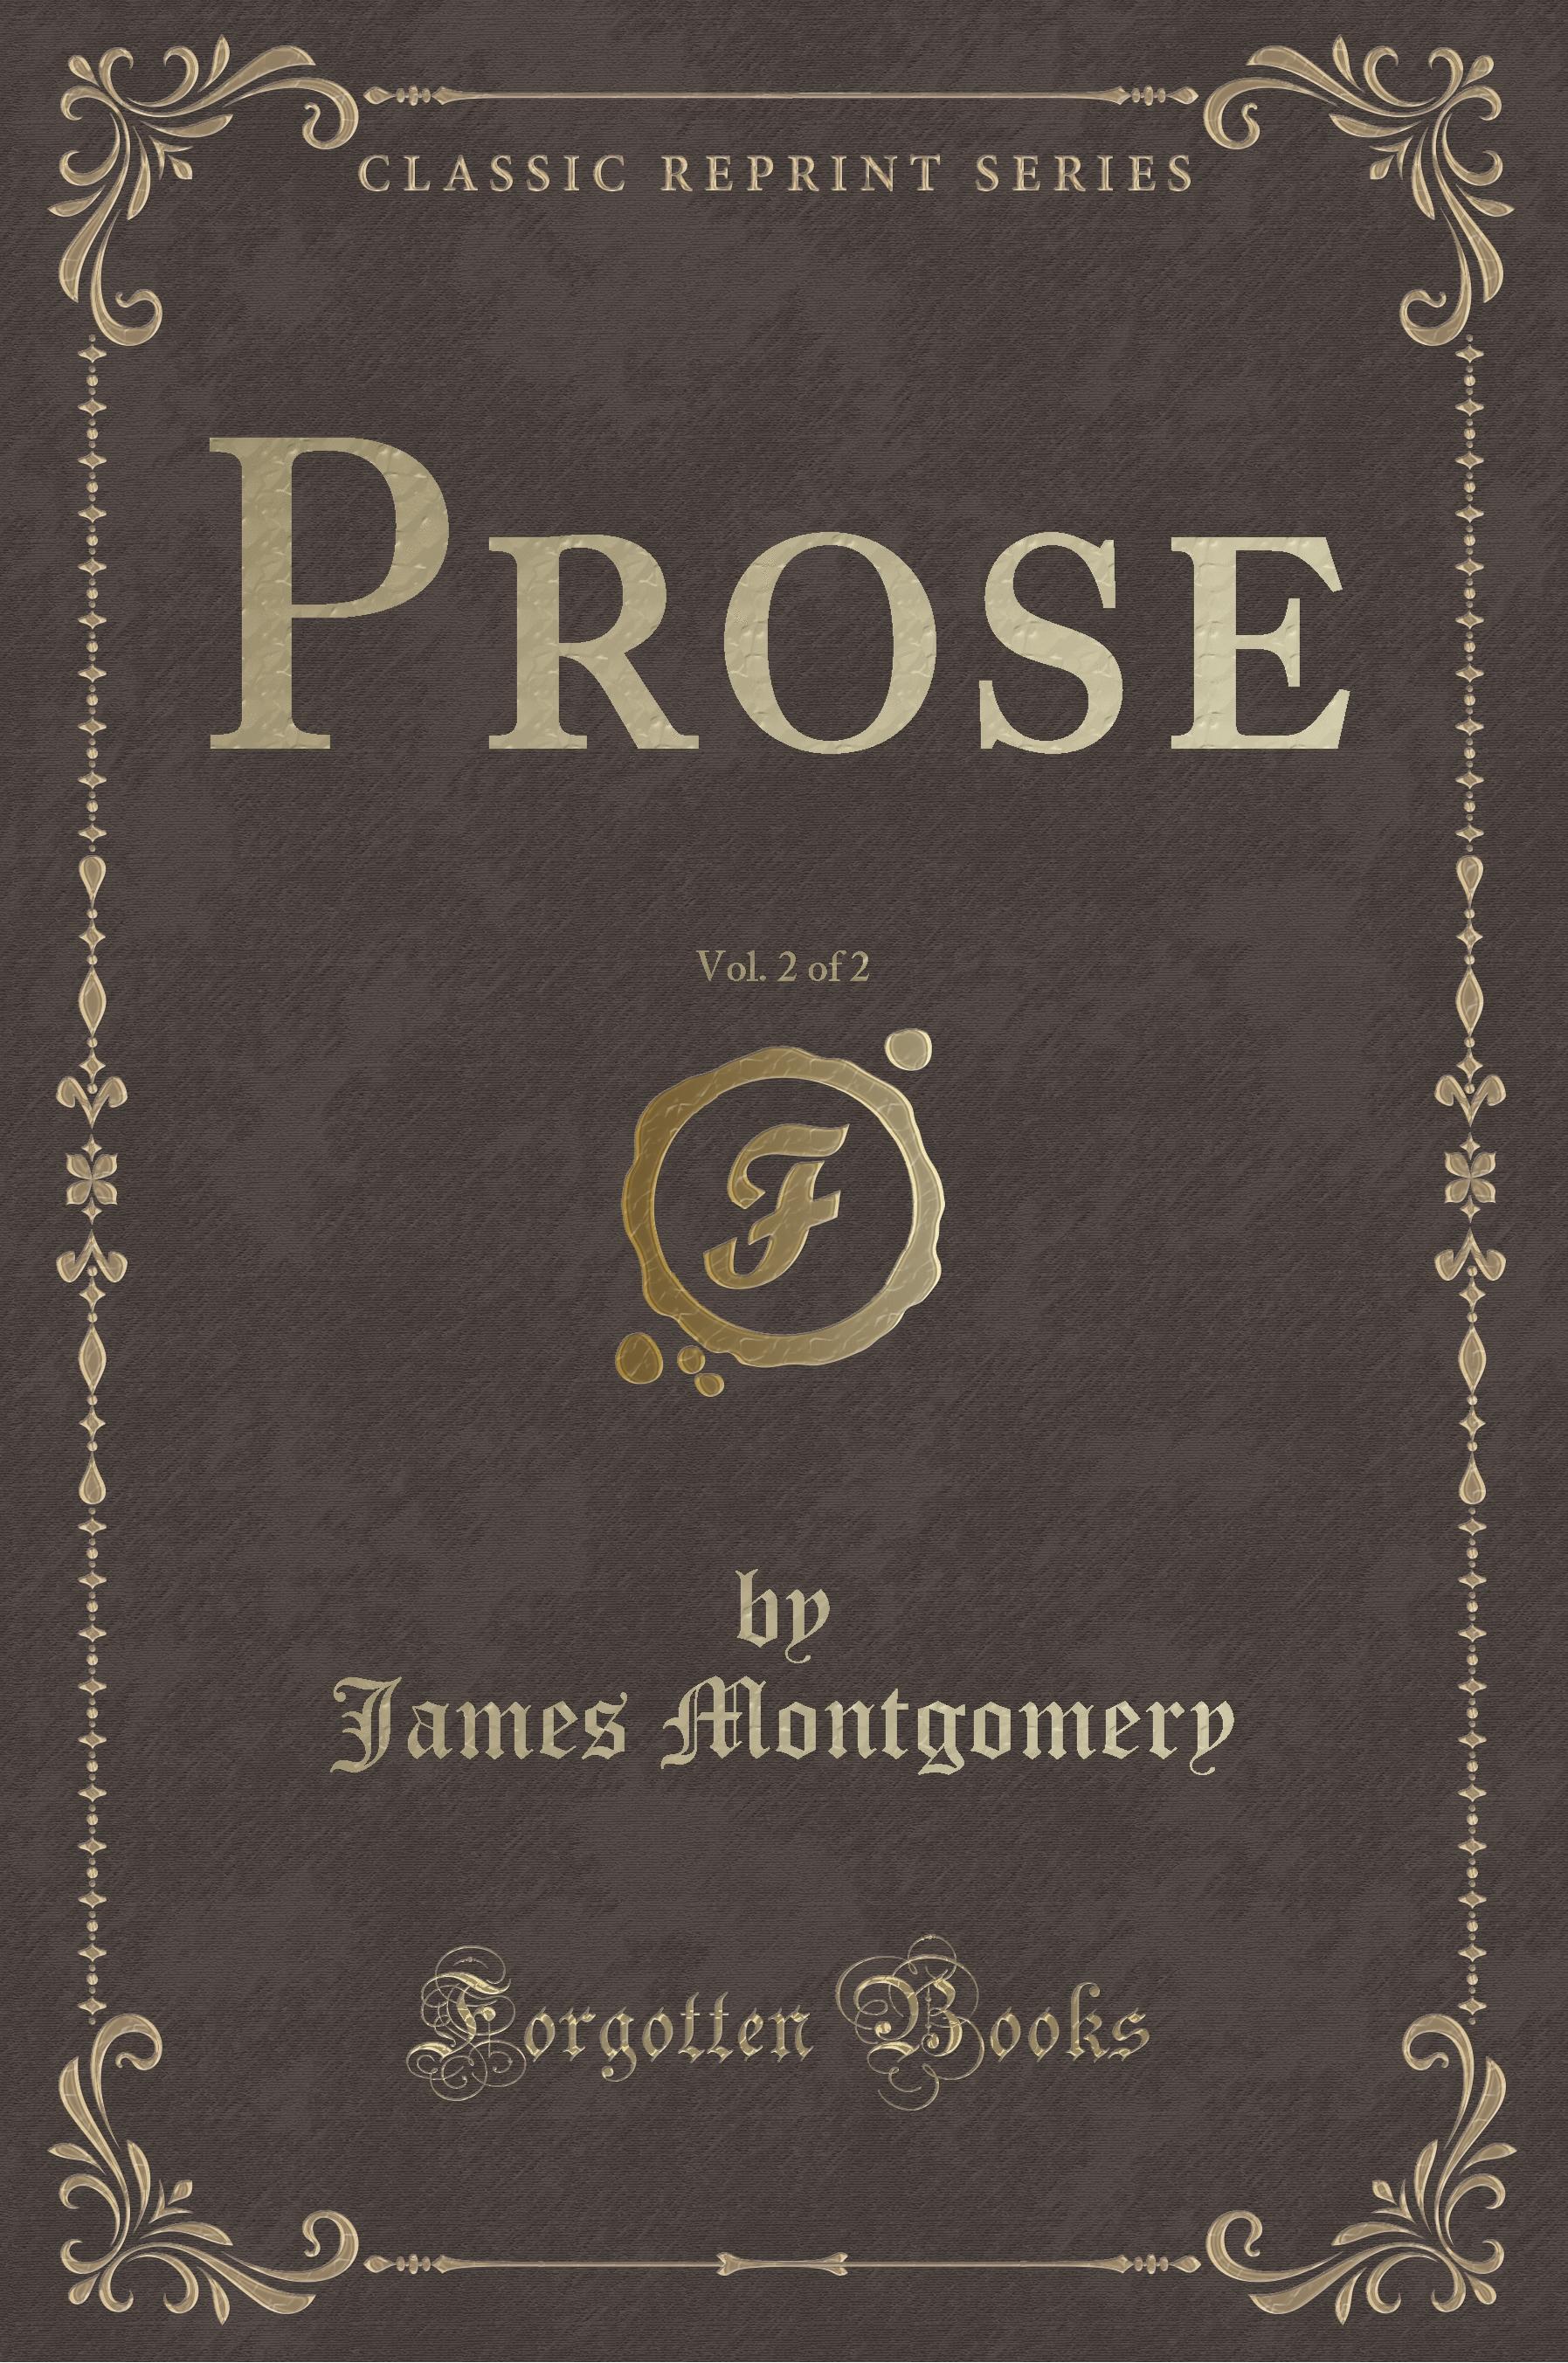 Montgomery, J: Prose, Vol. 2 of 2 (Classic Reprint)